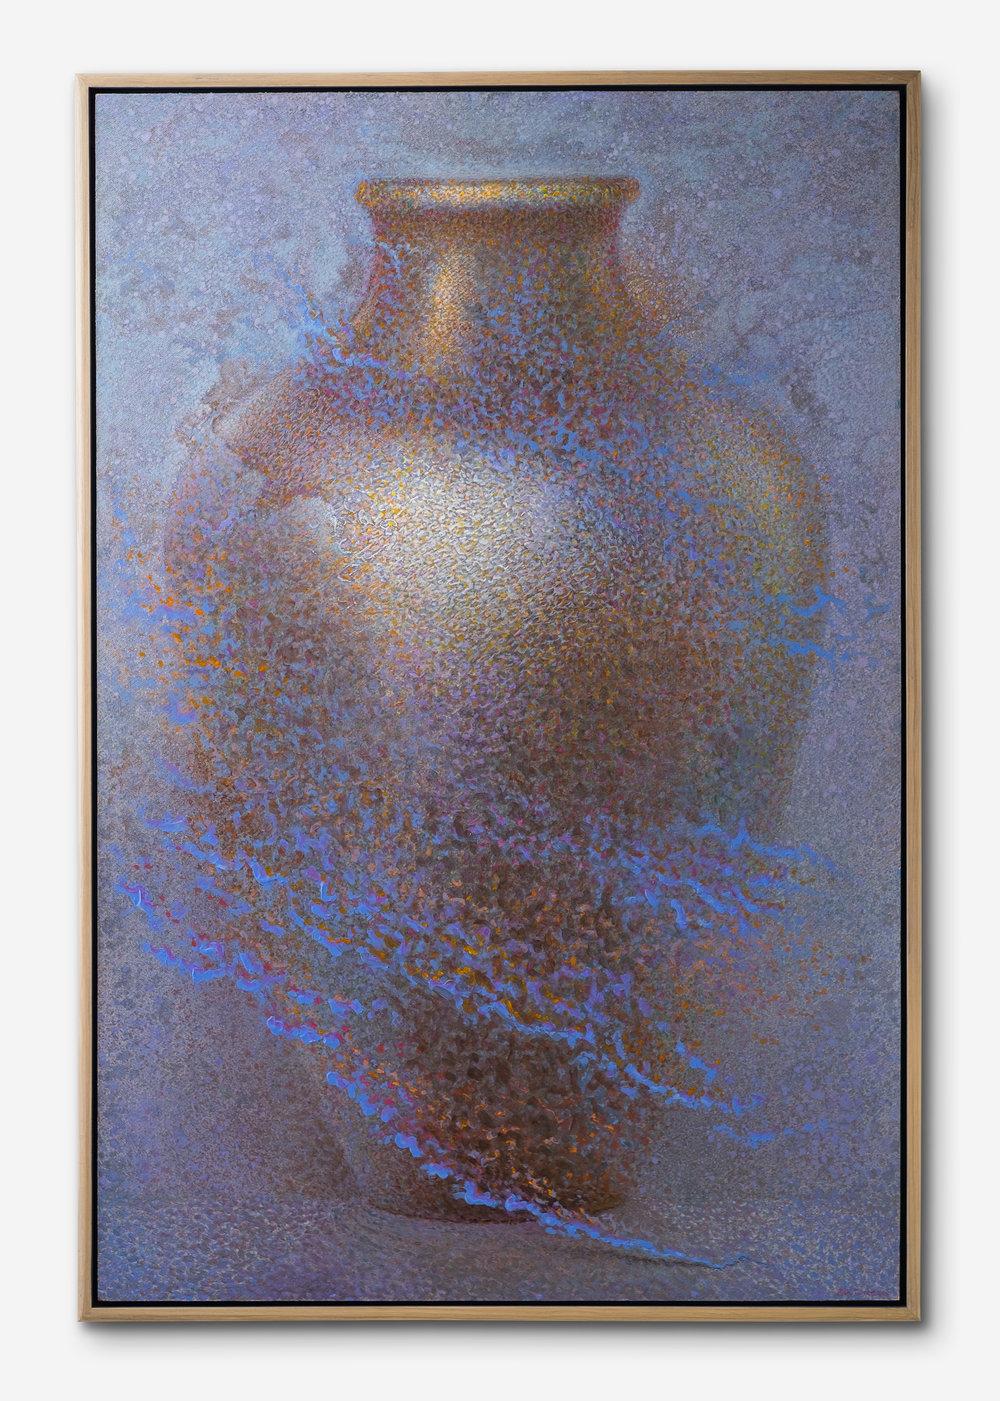 Earth Vase #36